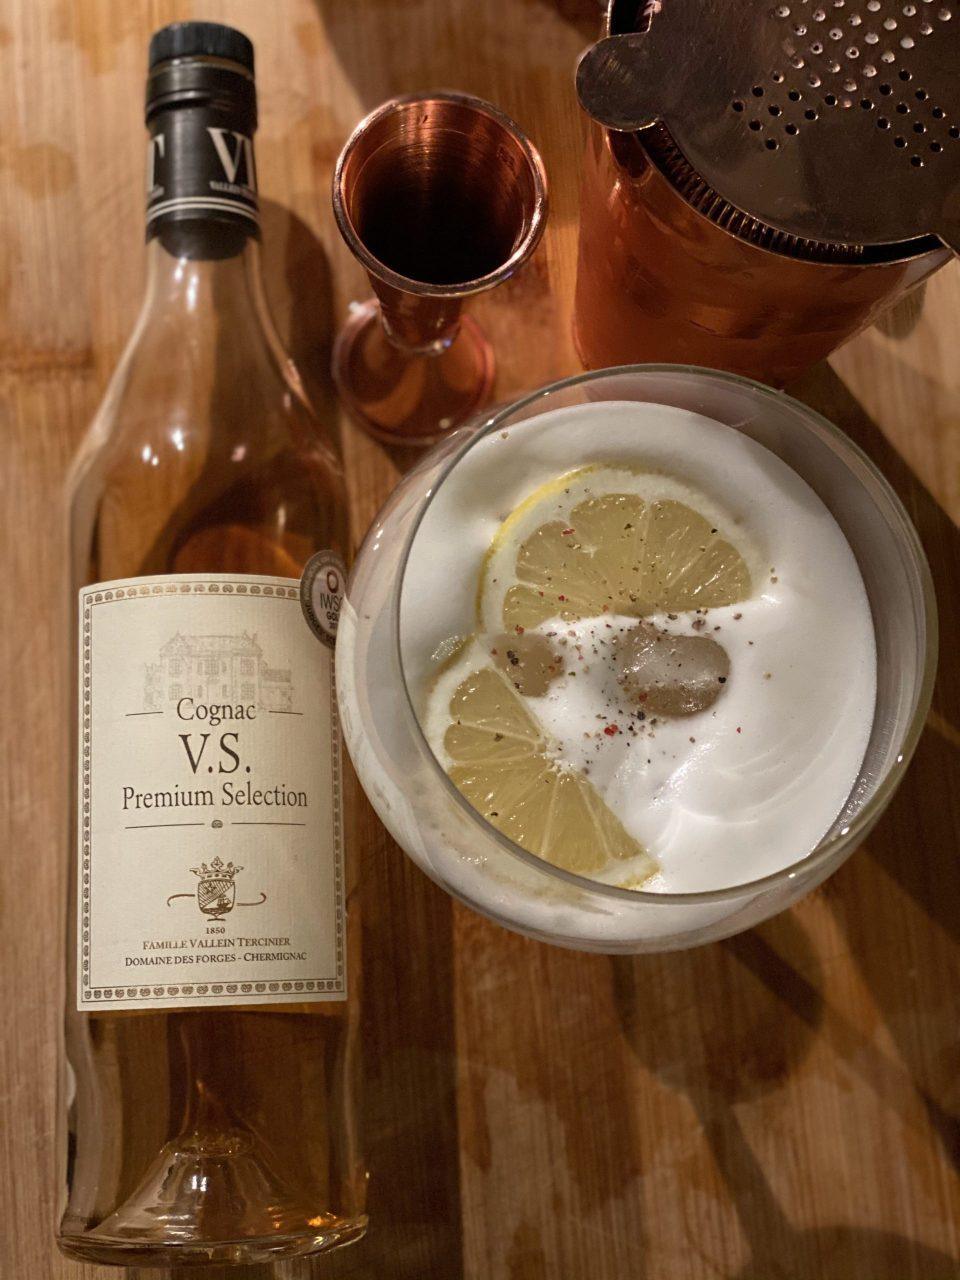 Vallein Tercinier V.S cocktail